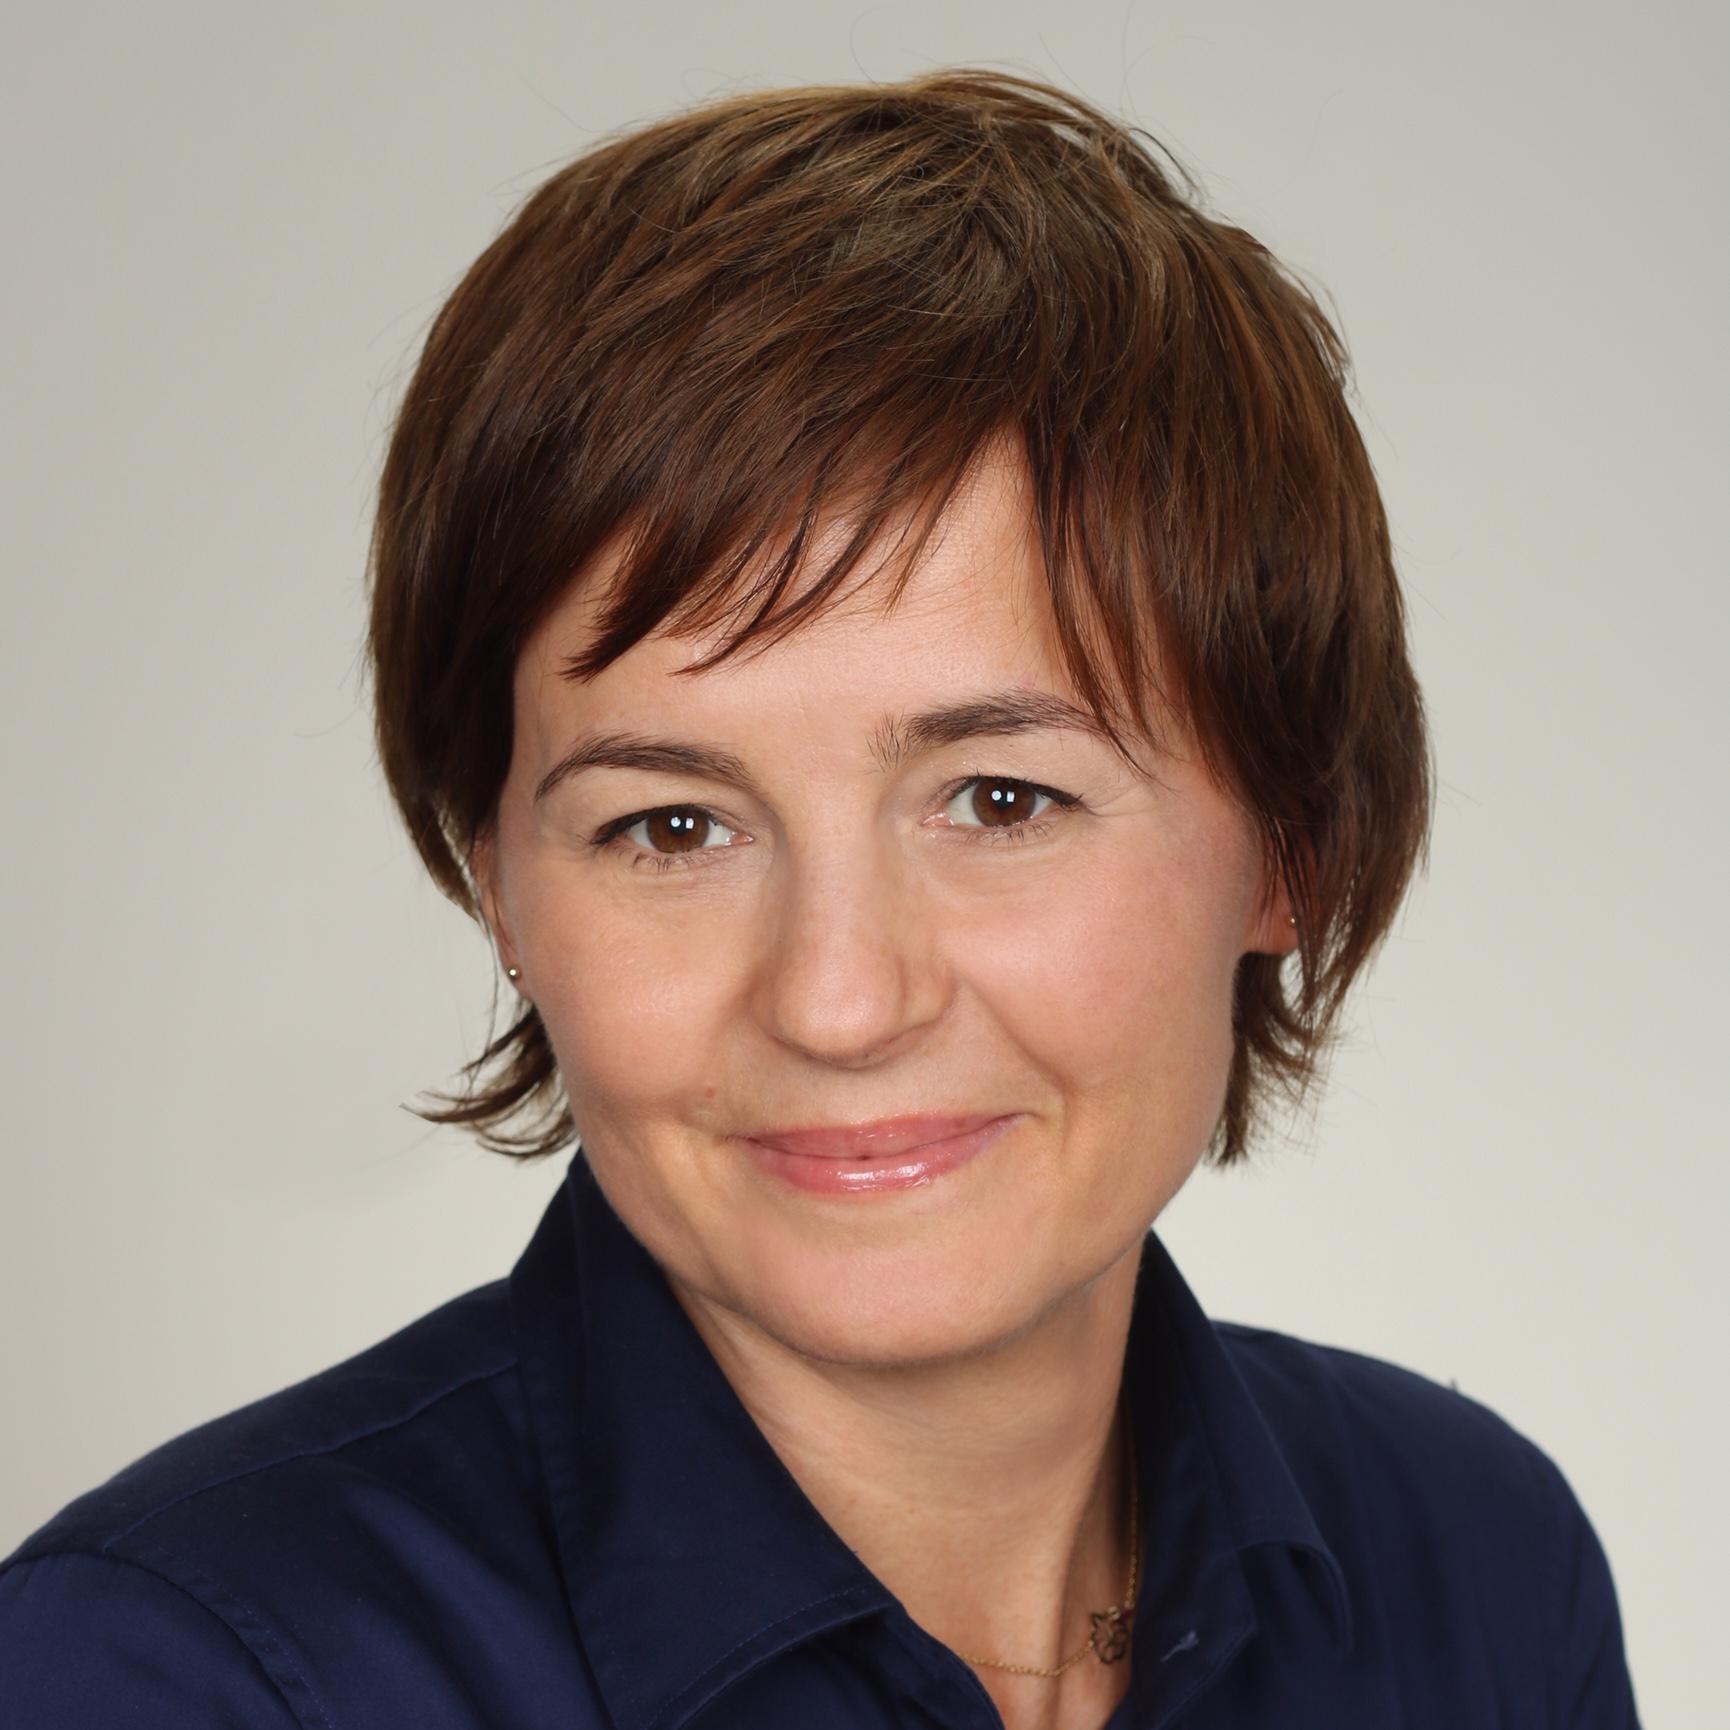 Dr hab n.med. Iwona Rospond-Kubiak